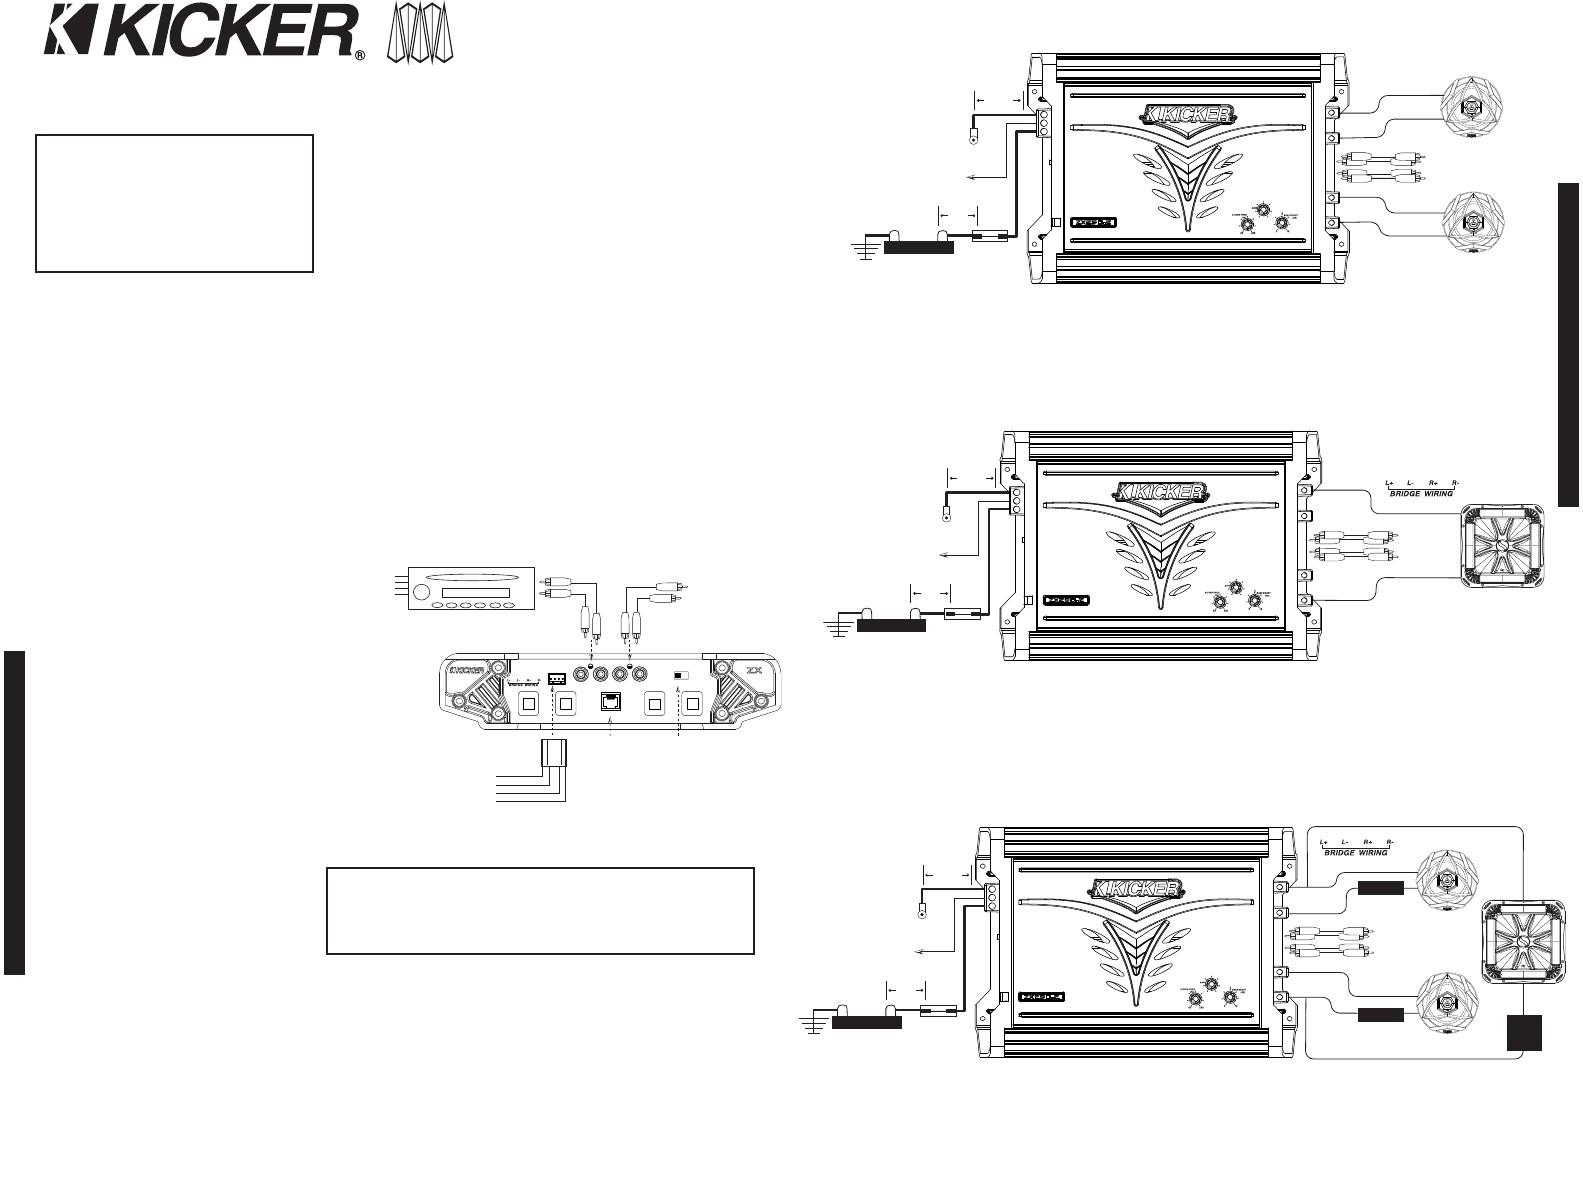 kicker comp 12 wiring diagram 1994 isuzu trooper radio r image